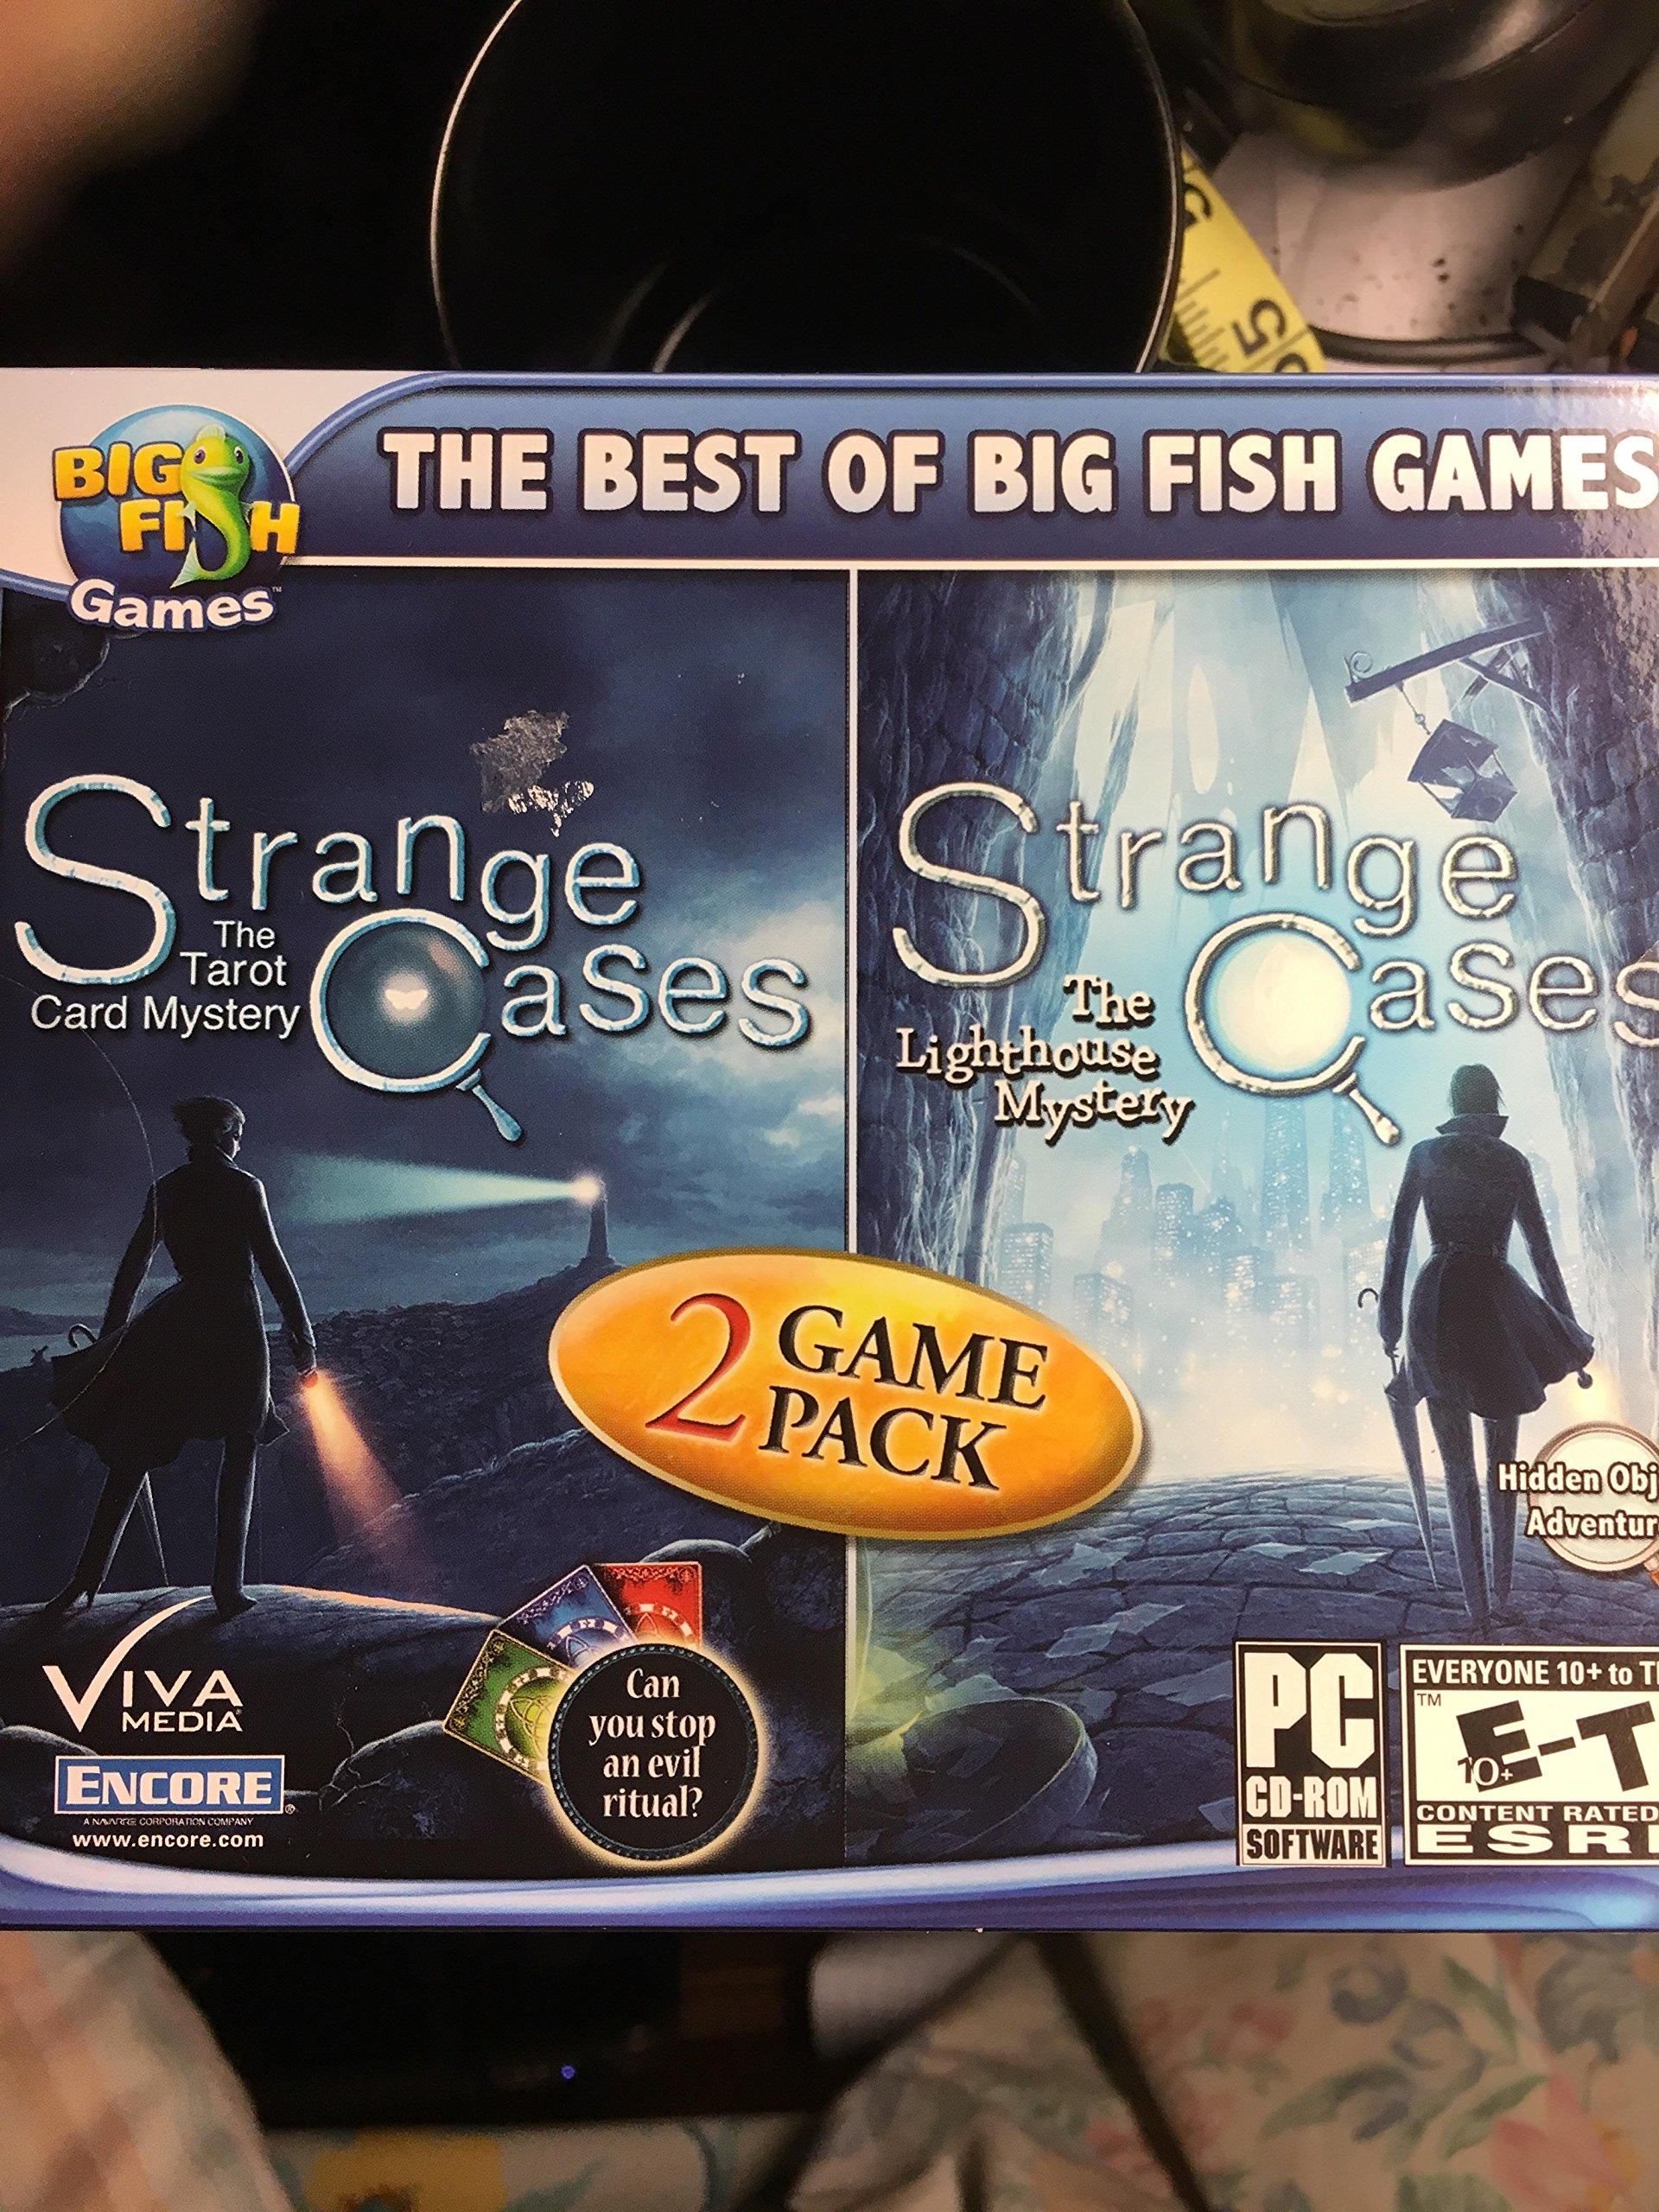 Amazon STRANGE CASES THE TAROT CARD MYSTERY STRANGE CASES THE